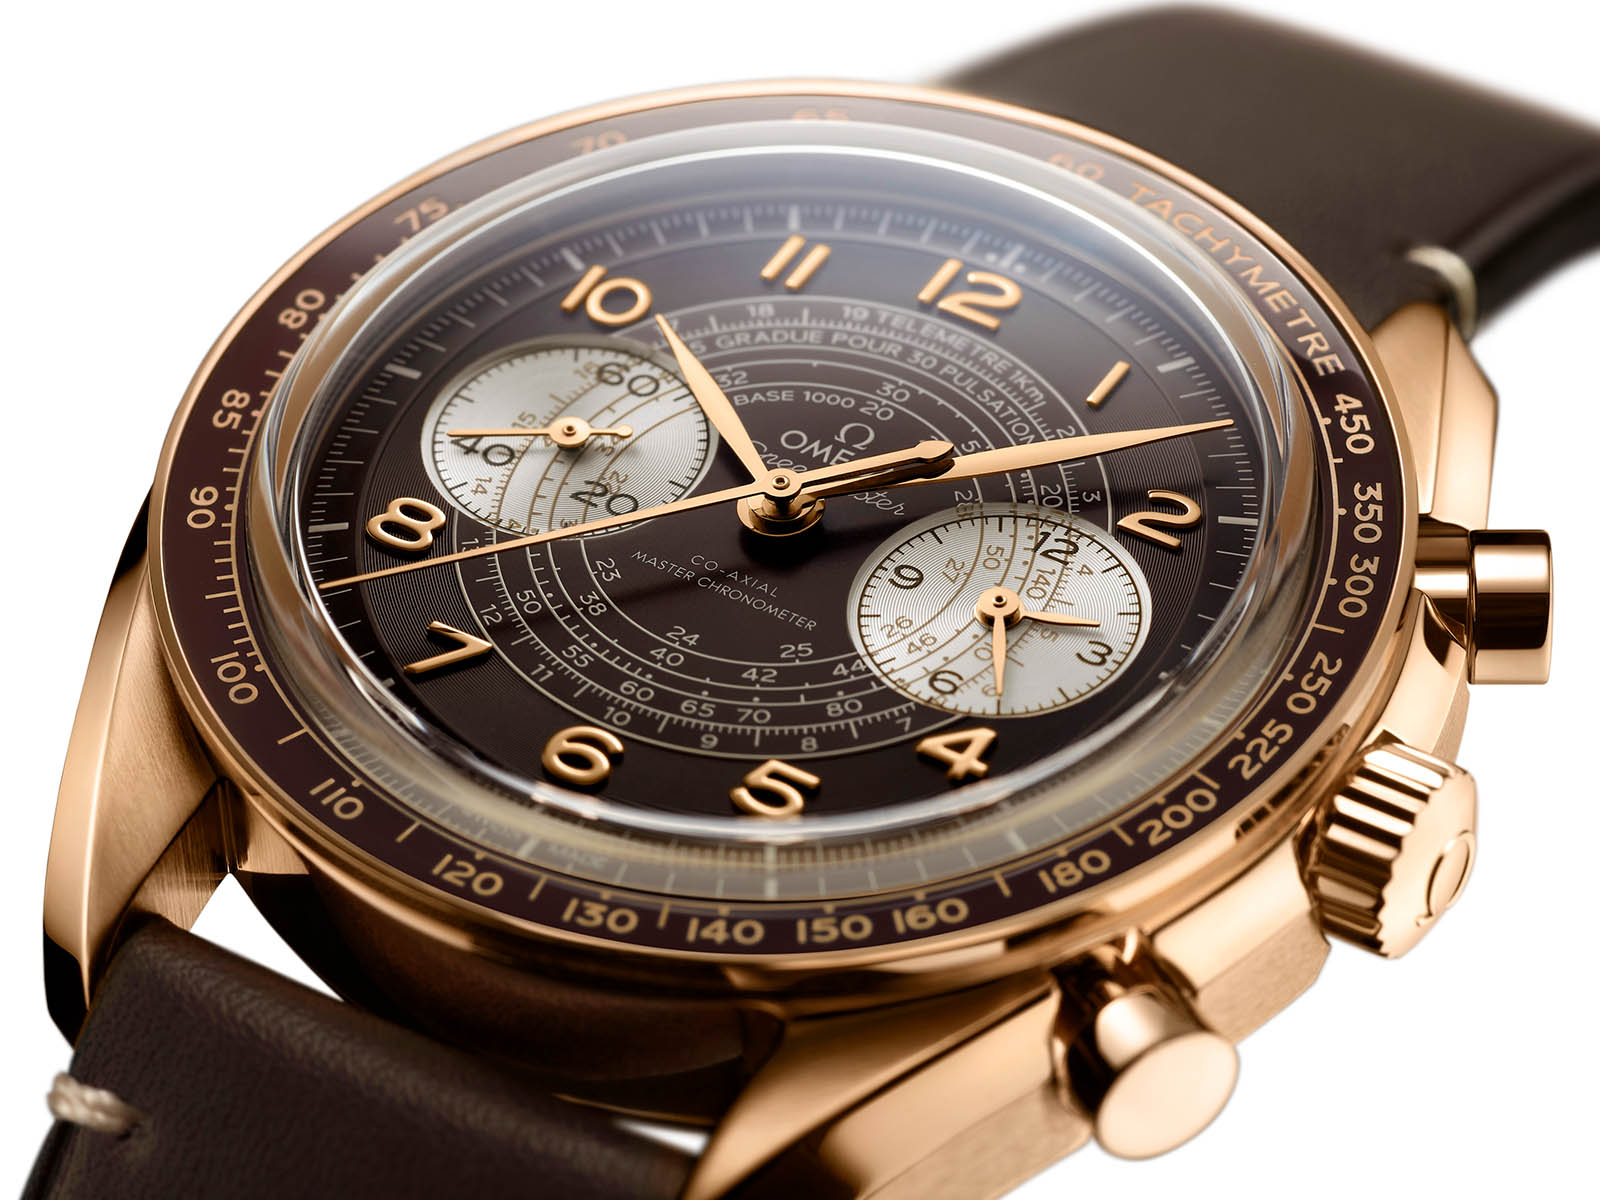 omega-speedmaster-chronoscope-co-axial-master-chronometer-chronograph-3.jpg